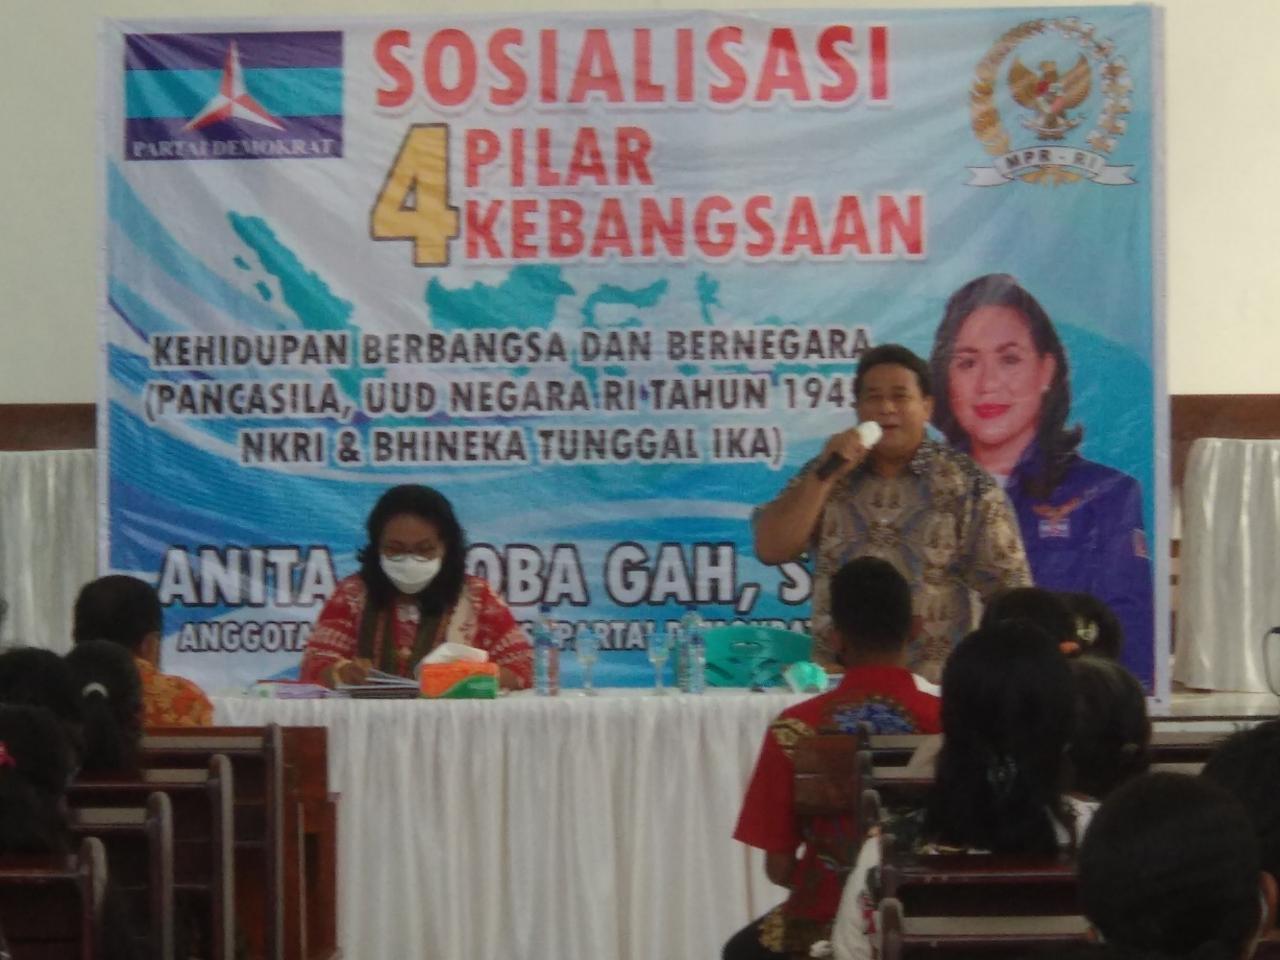 Anita Gah Sosialisasi 4 Pilar Kebangsaan di Kupang